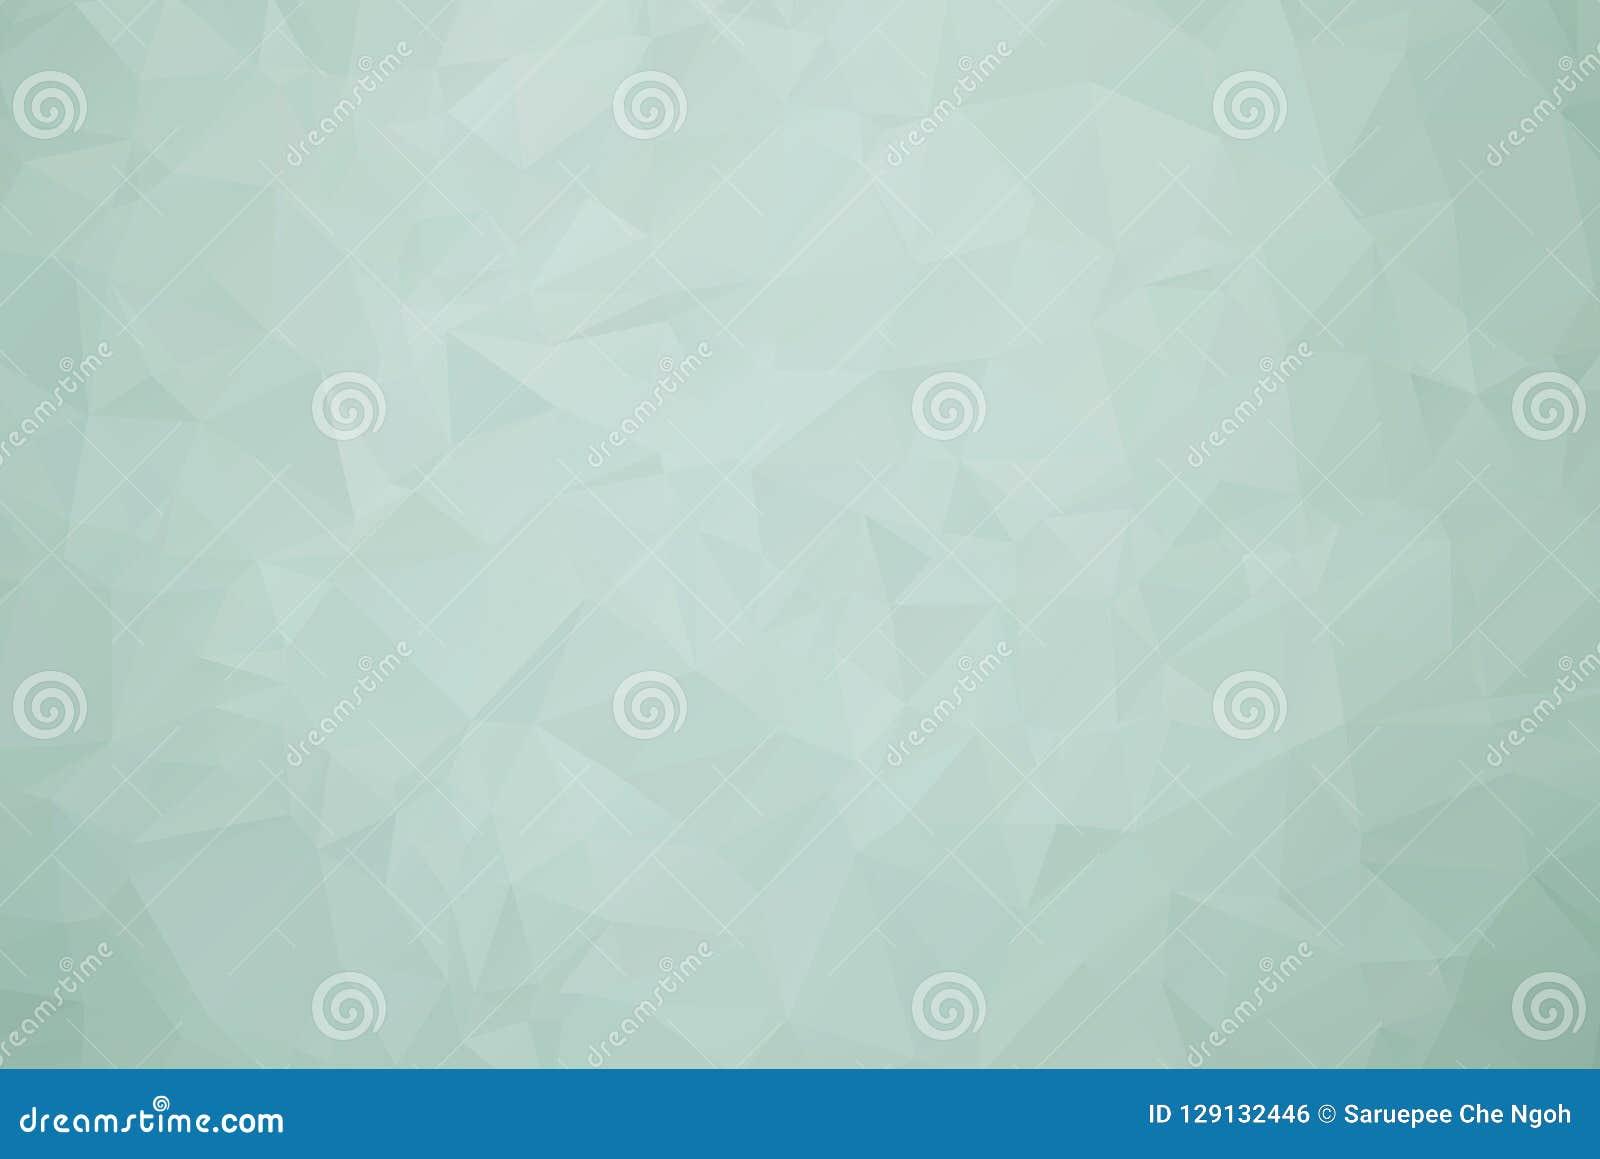 Polygonal υπόβαθρο, δημιουργικά πρότυπα σχεδίου Κόκκινο polygonal υπόβαθρο απεικόνισης Χαμηλό πολυ ύφος Αφηρημένο πολύχρωμο geome